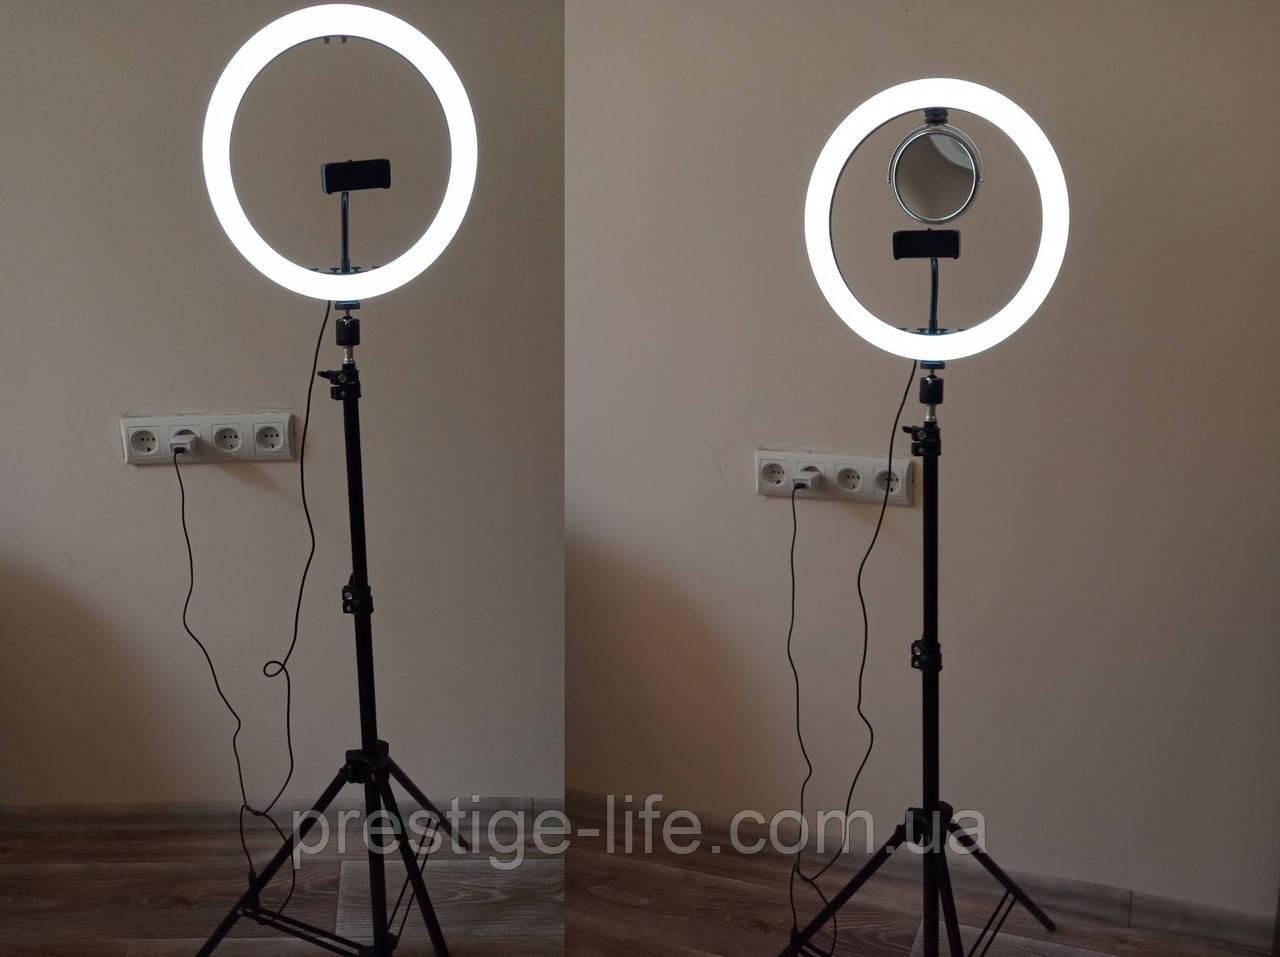 Кольцевая LED лампа SMN-12 диаметром 30 см со штативом и зеркалом